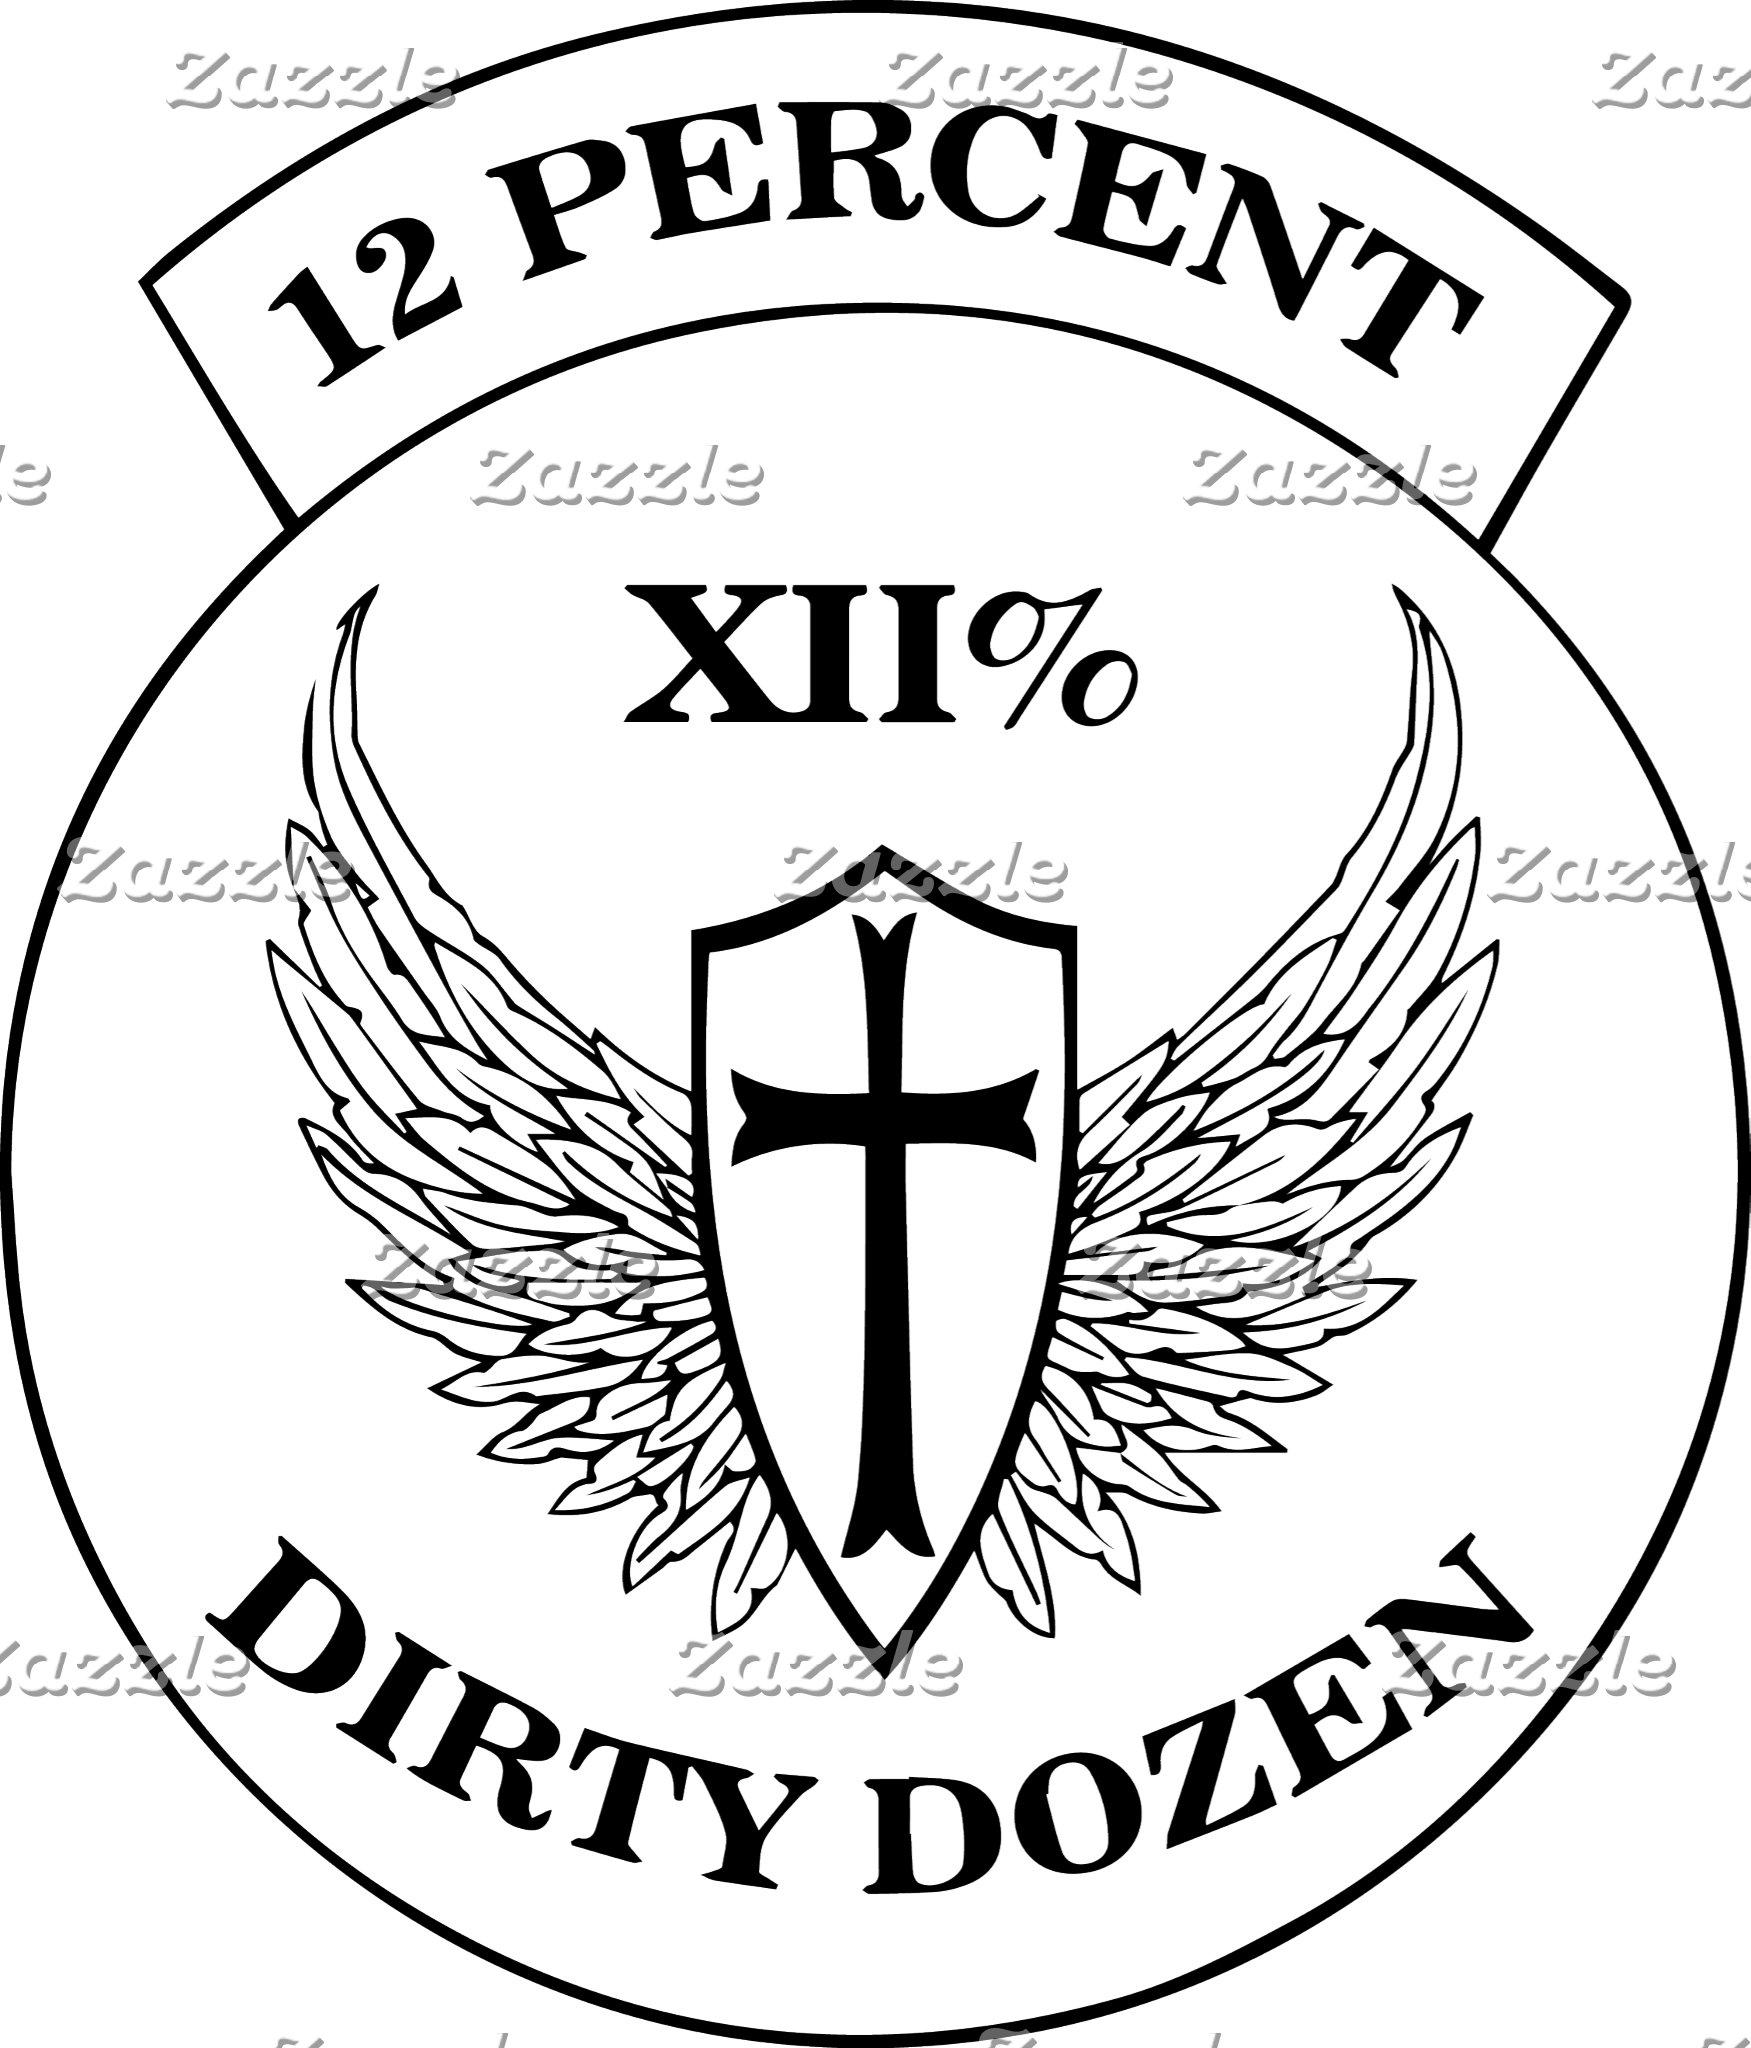 12% DIRTY DOZEN